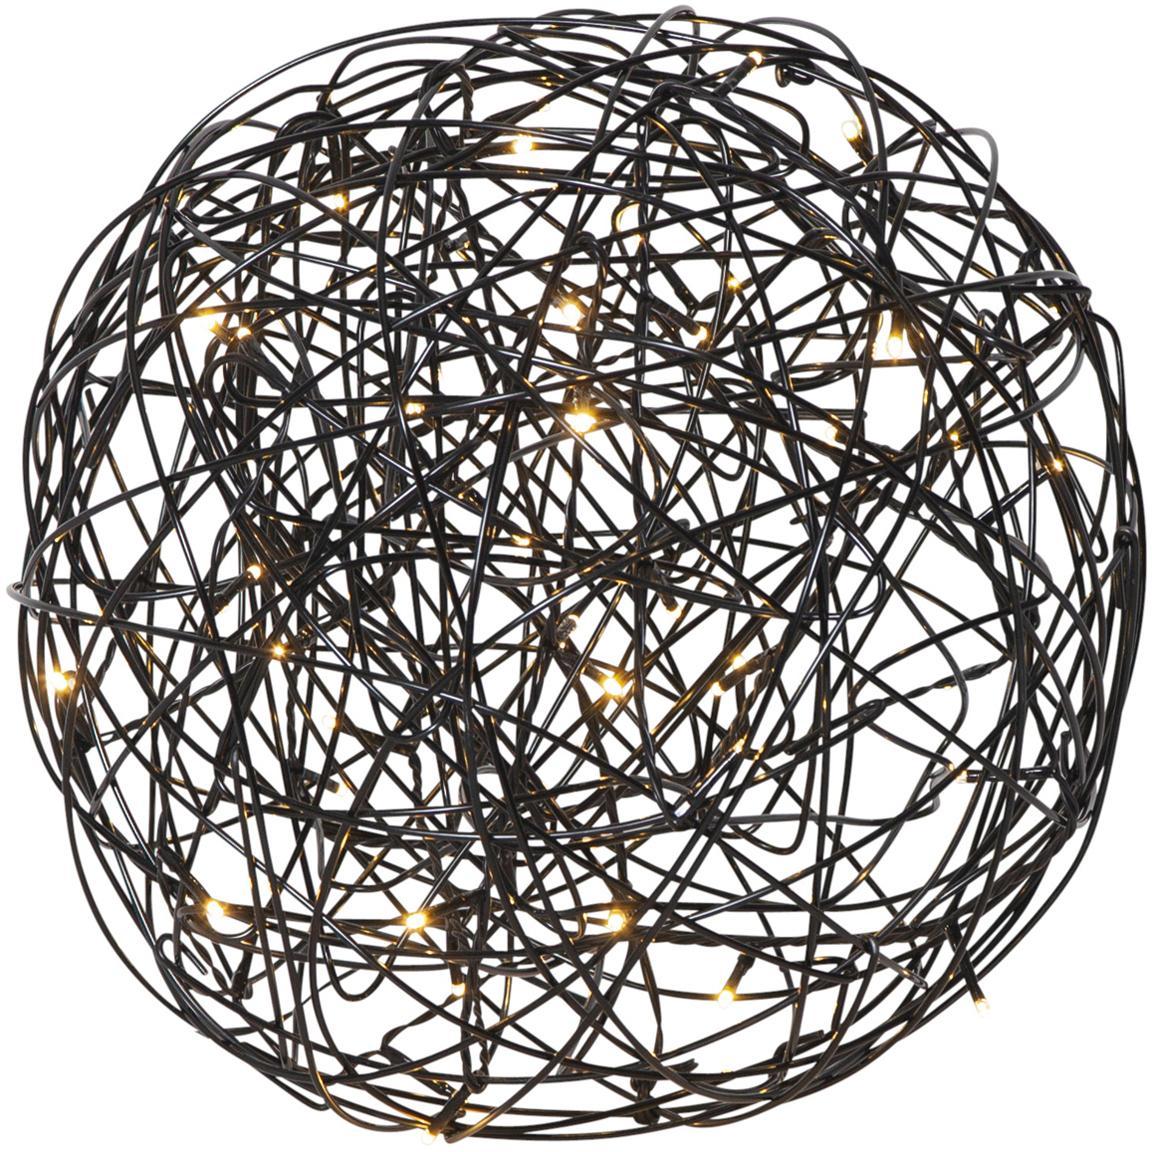 LED Aussenleuchte Trassel, Metall, Aluminium, Schwarz, Ø 30 x H 30 cm